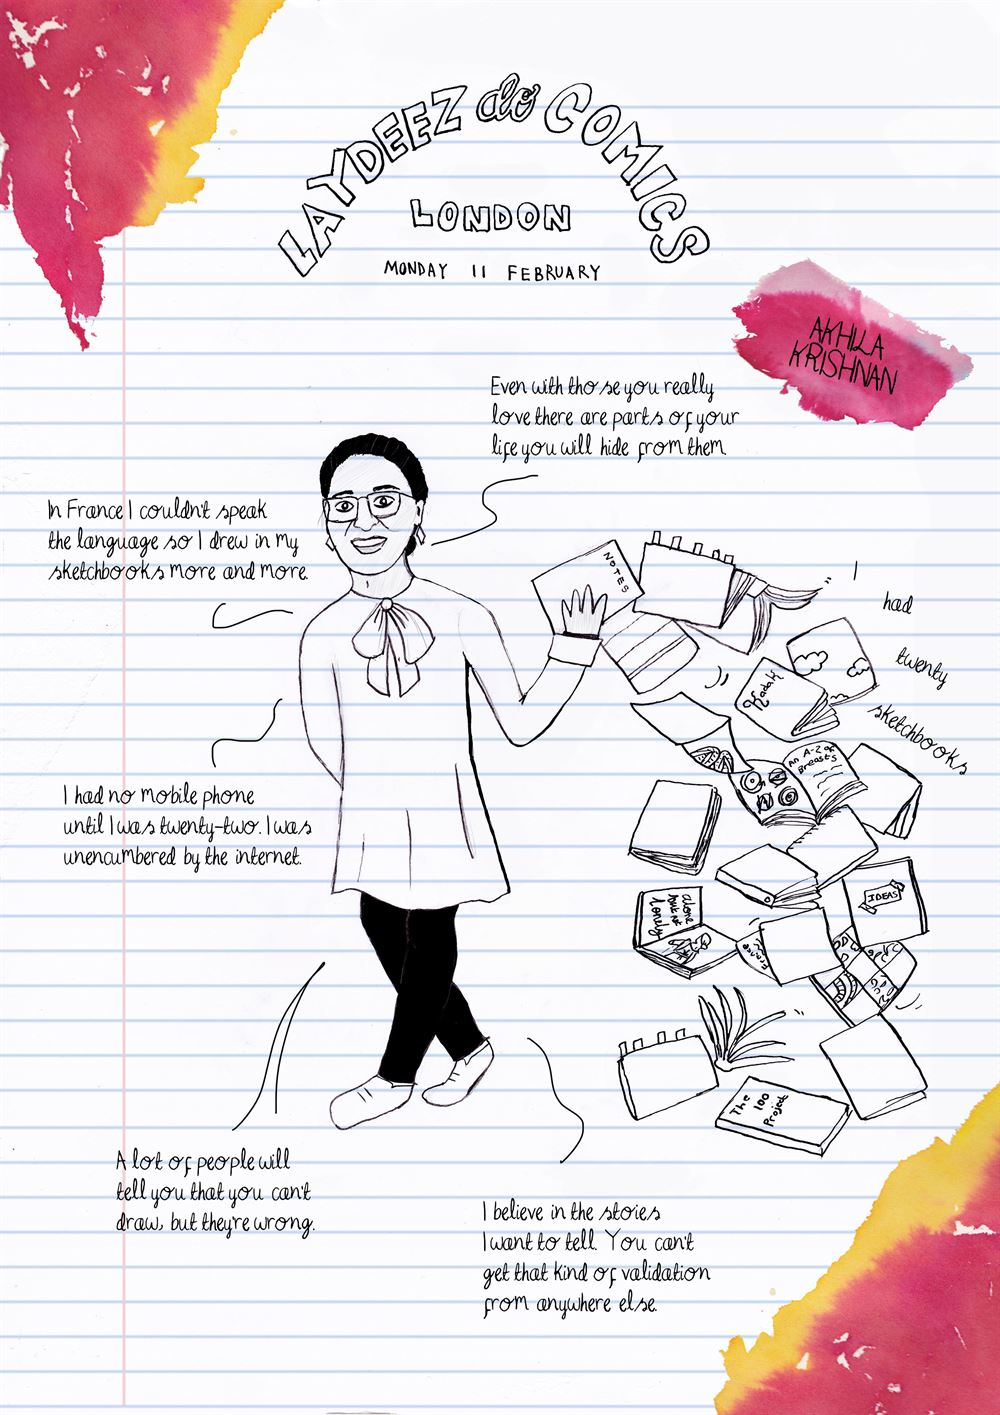 Laydeez Do Comics Blog - Page 1